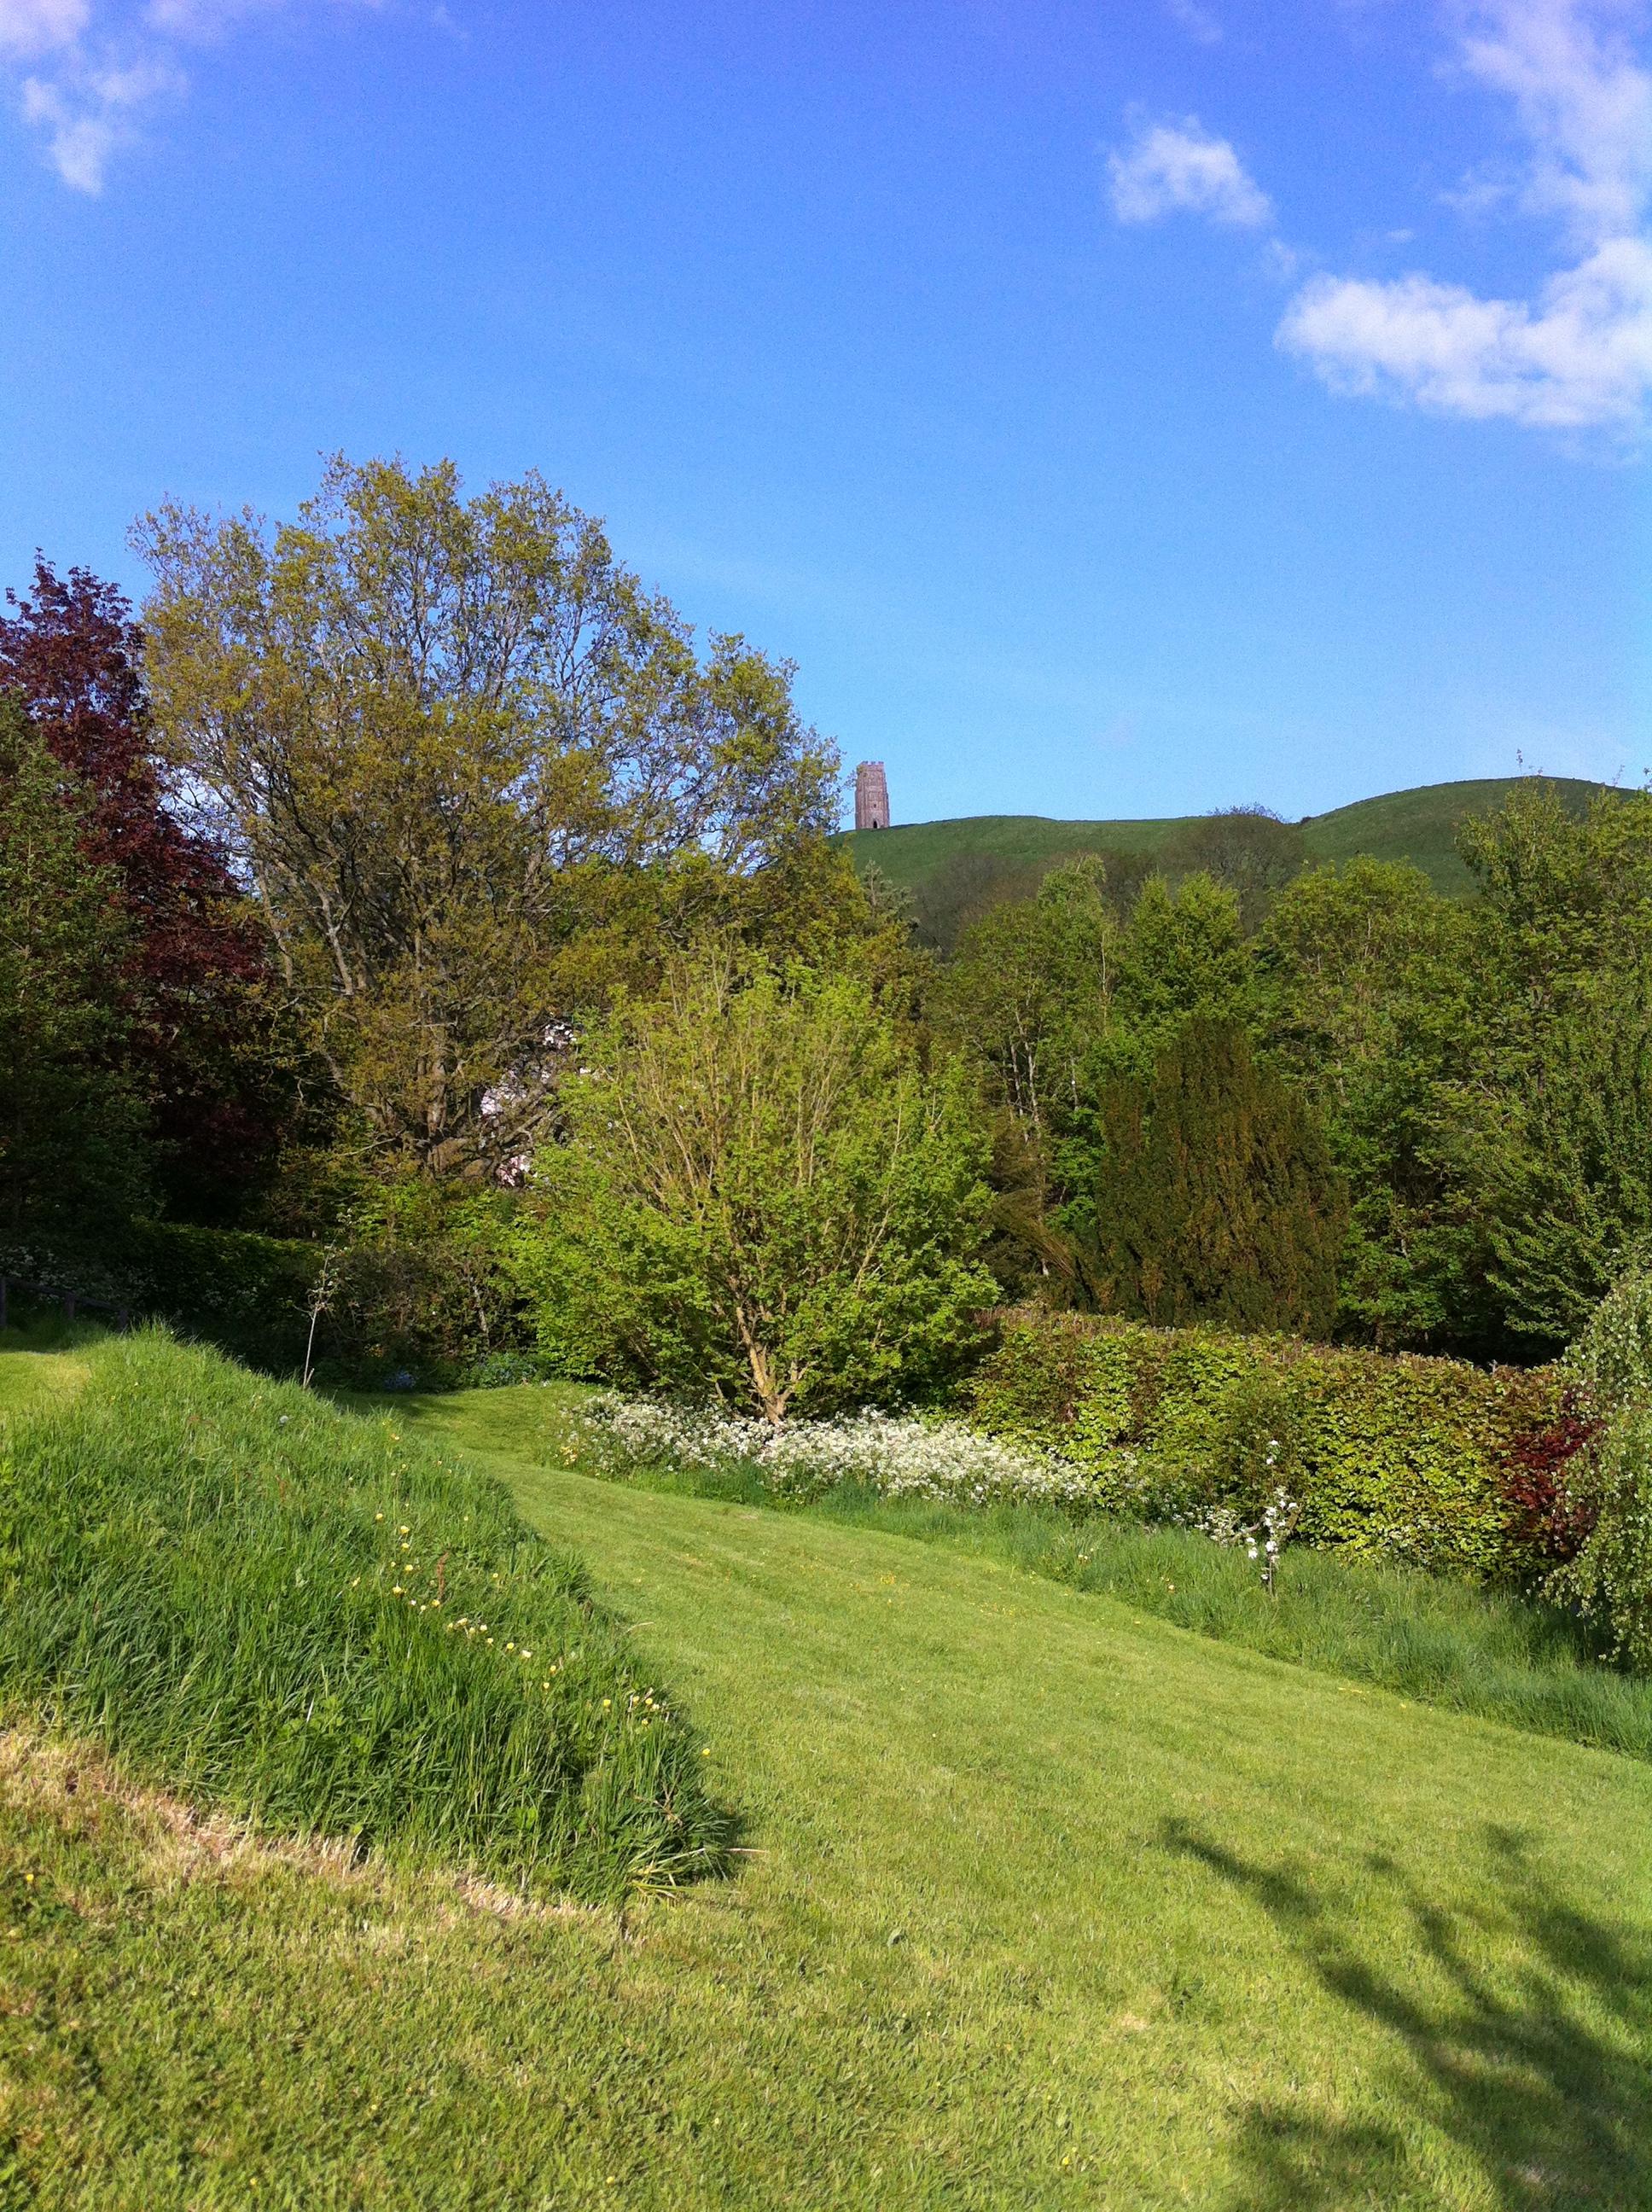 Glastonbury Tor from Chalice Well Garden